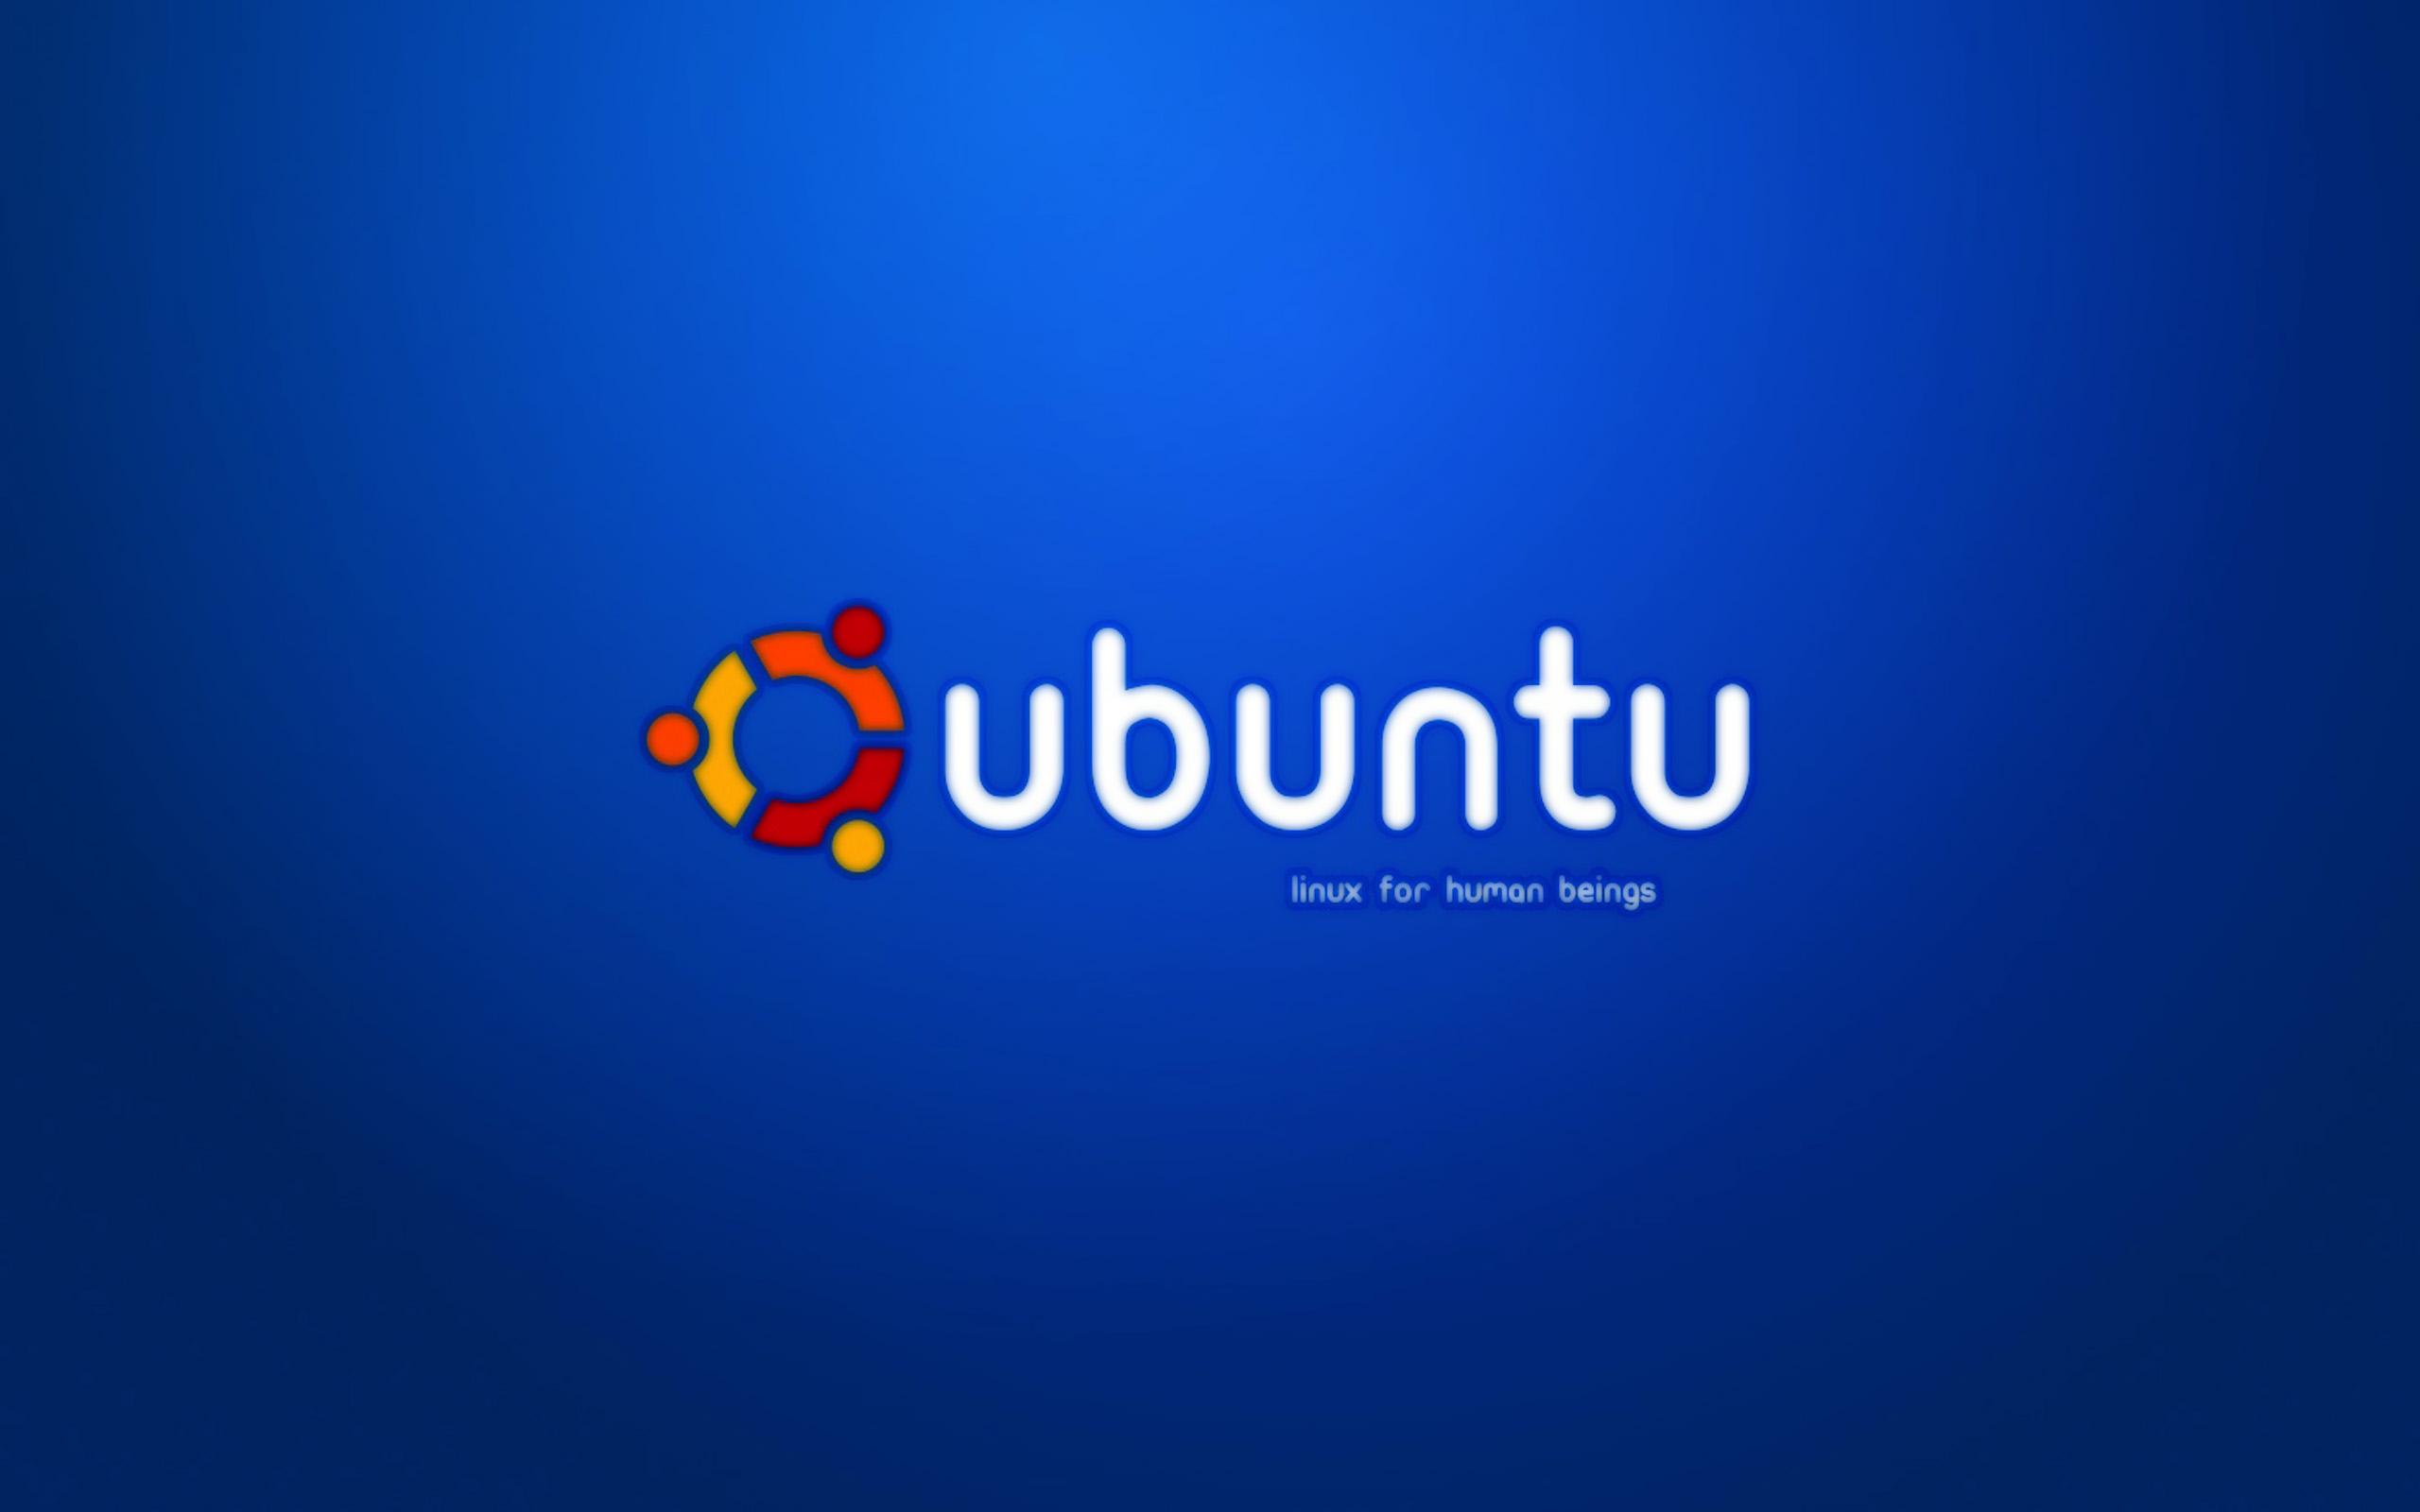 2560x1600 Blue Ubuntu desktop PC and Mac wallpaper 2560x1600